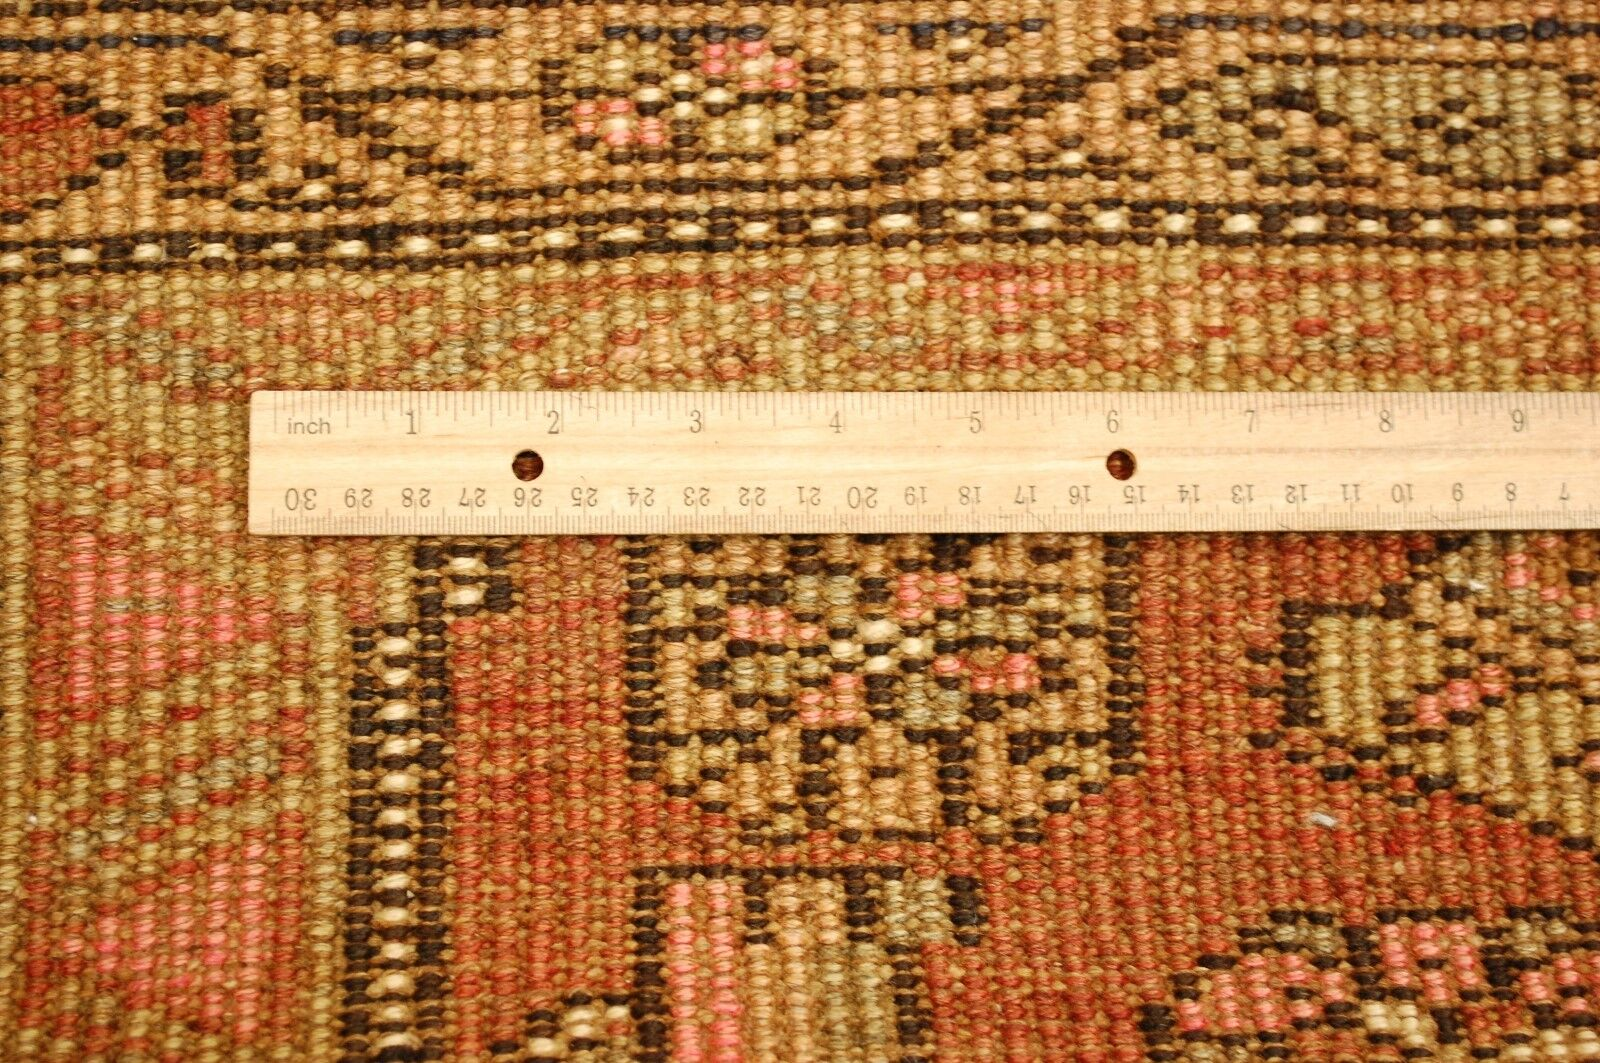 c1920s ANTIQUE CLASSIC VILLAGE WOVEN PERSIAN BIJAR HALVAI RUG 4x9.3 ALL WOOL